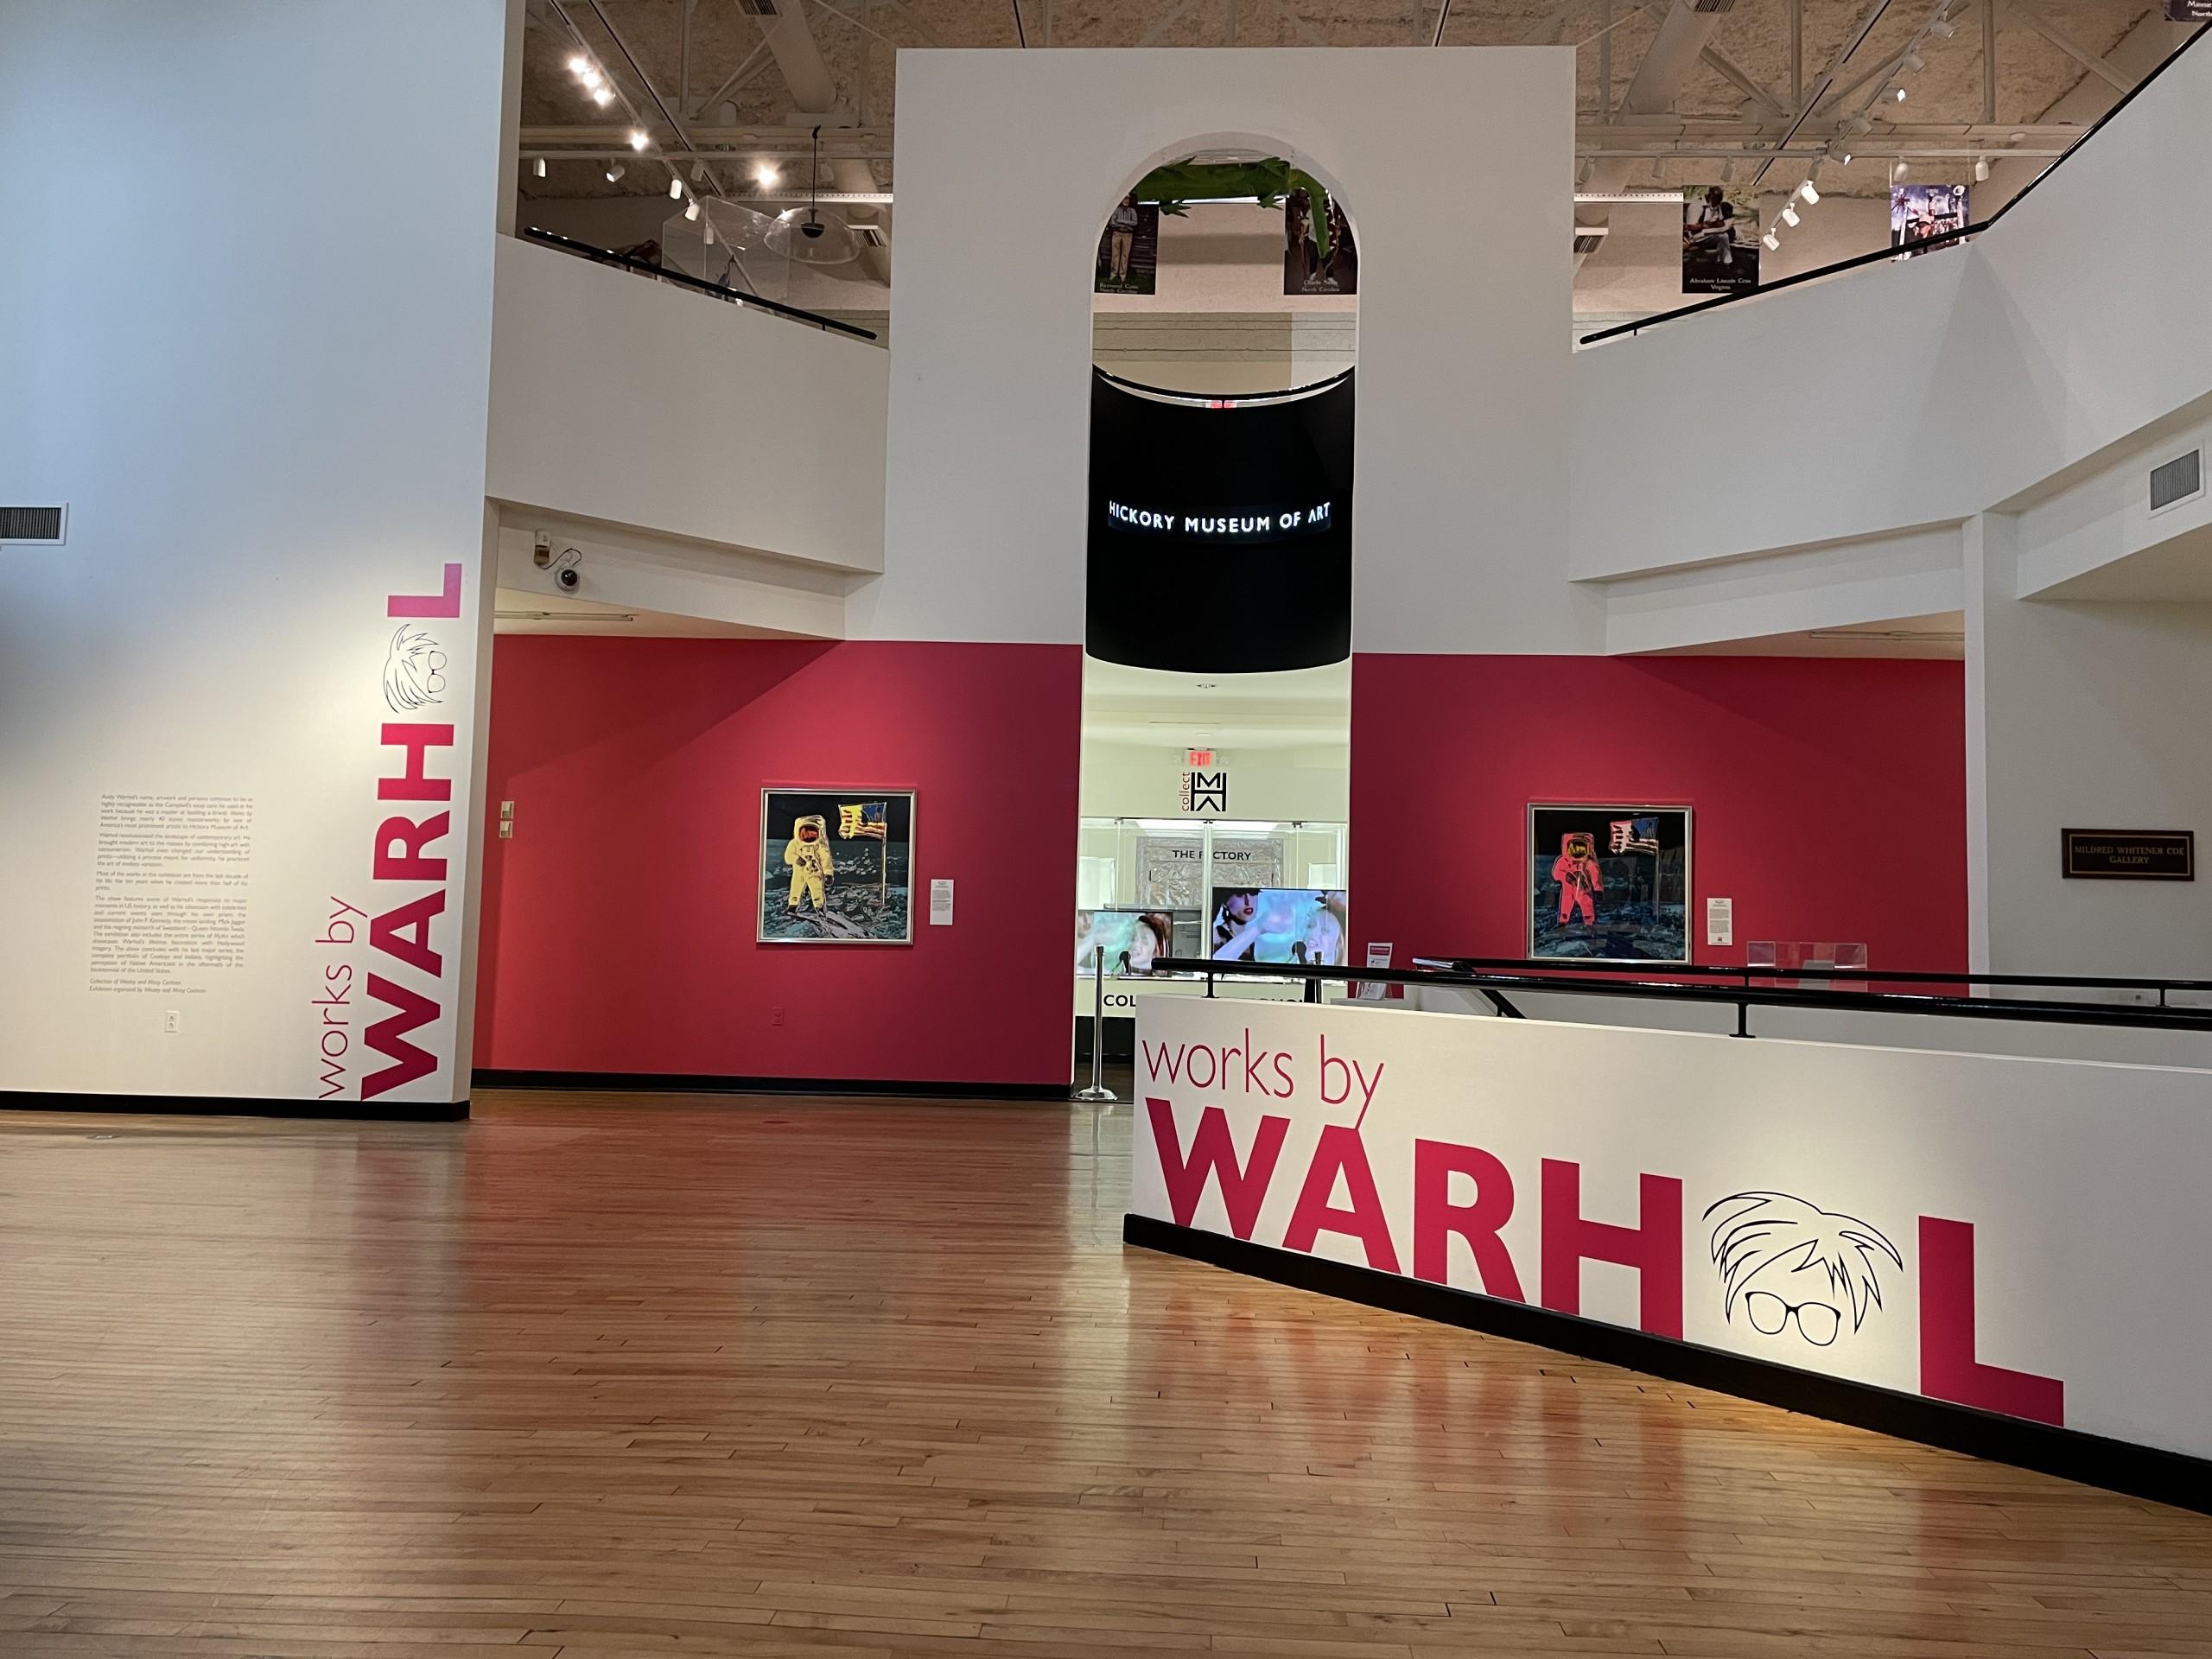 Img 3397 Warhol